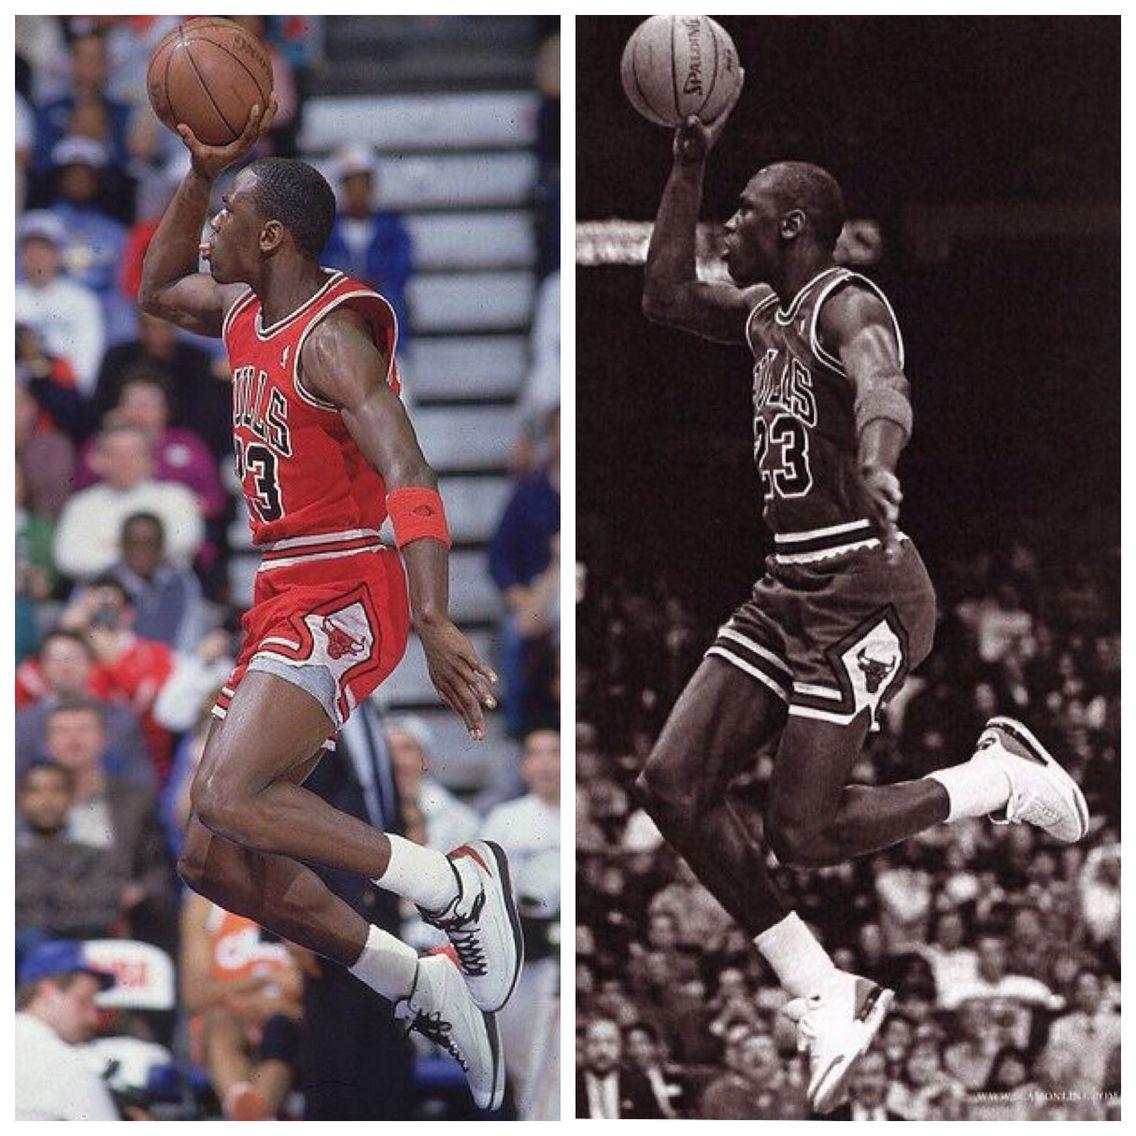 Michael Jordan 1987 vs 1988